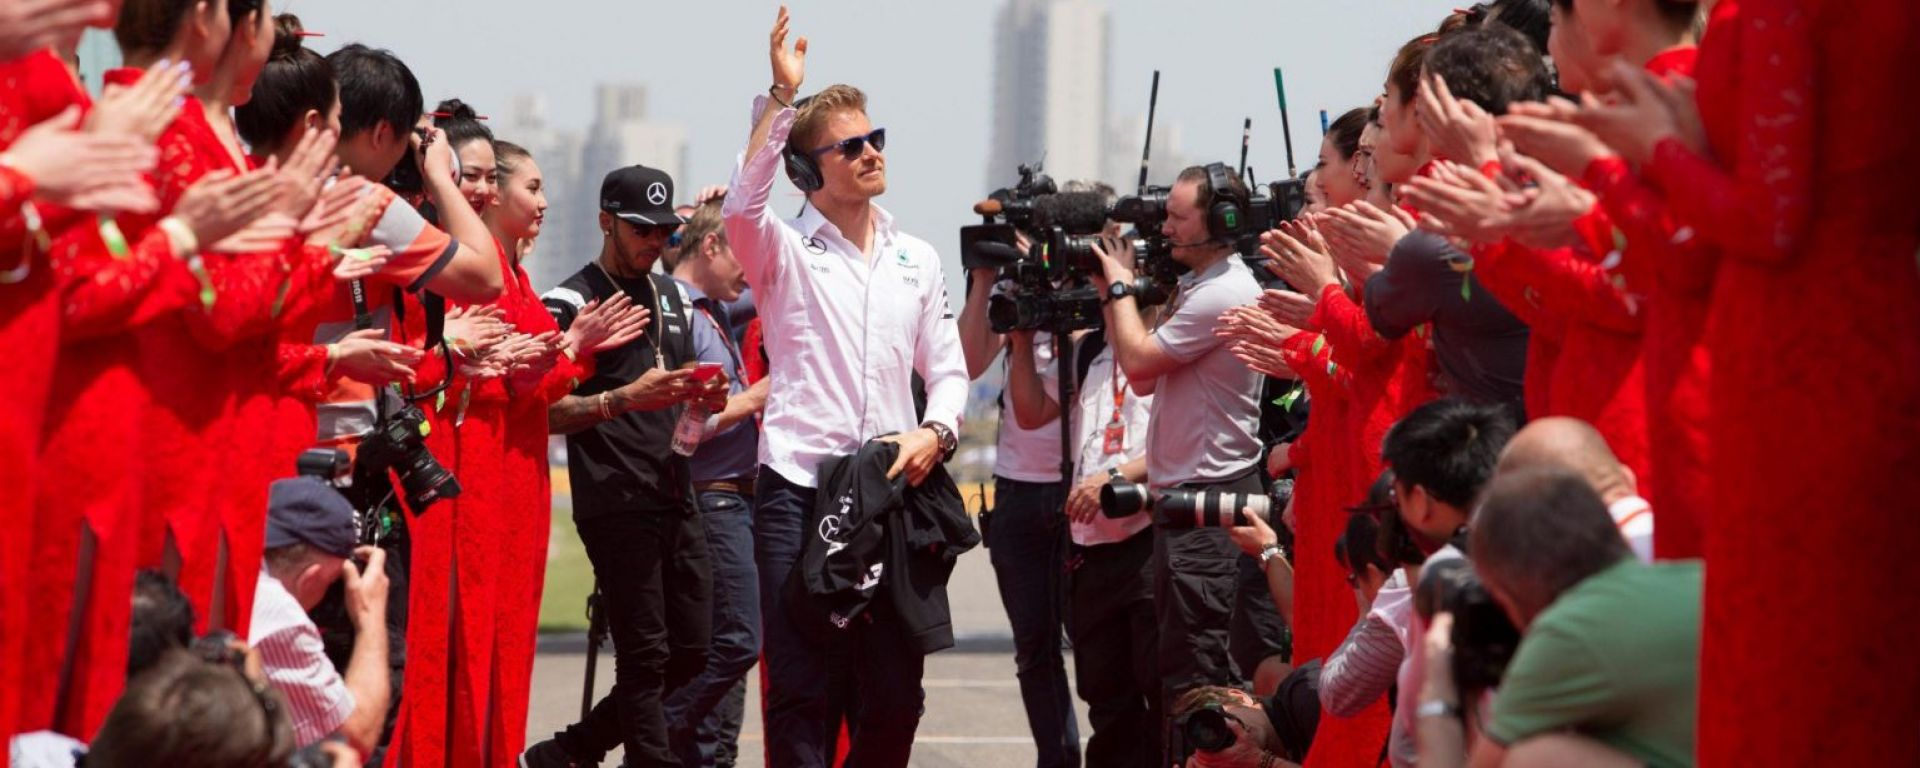 F1 GP Cina: Le pagelle